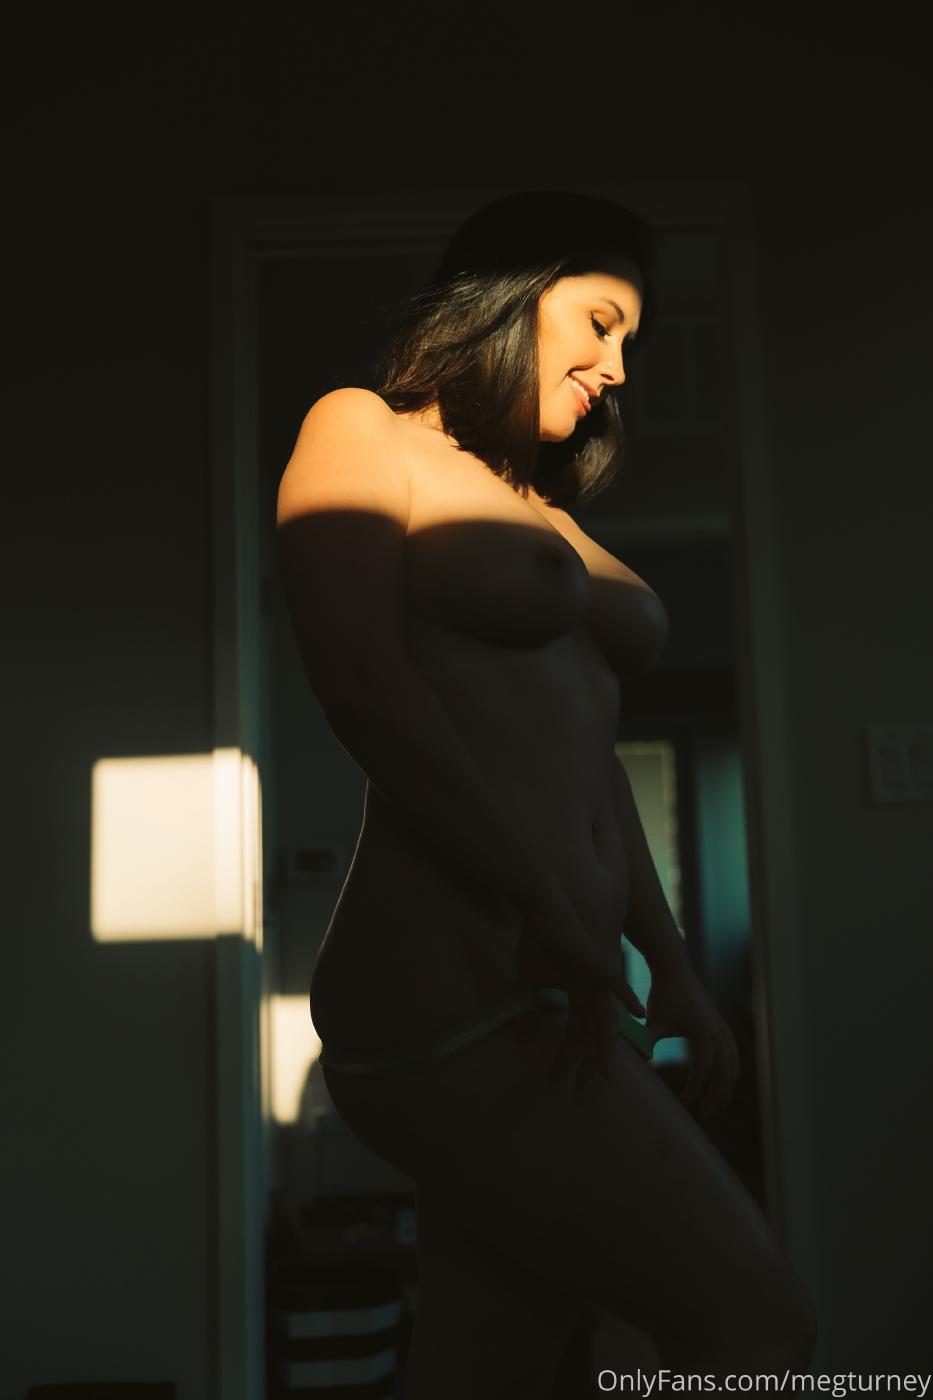 Meg Turney Nude Sunset Onlyfans Set Leaked Vxgtka